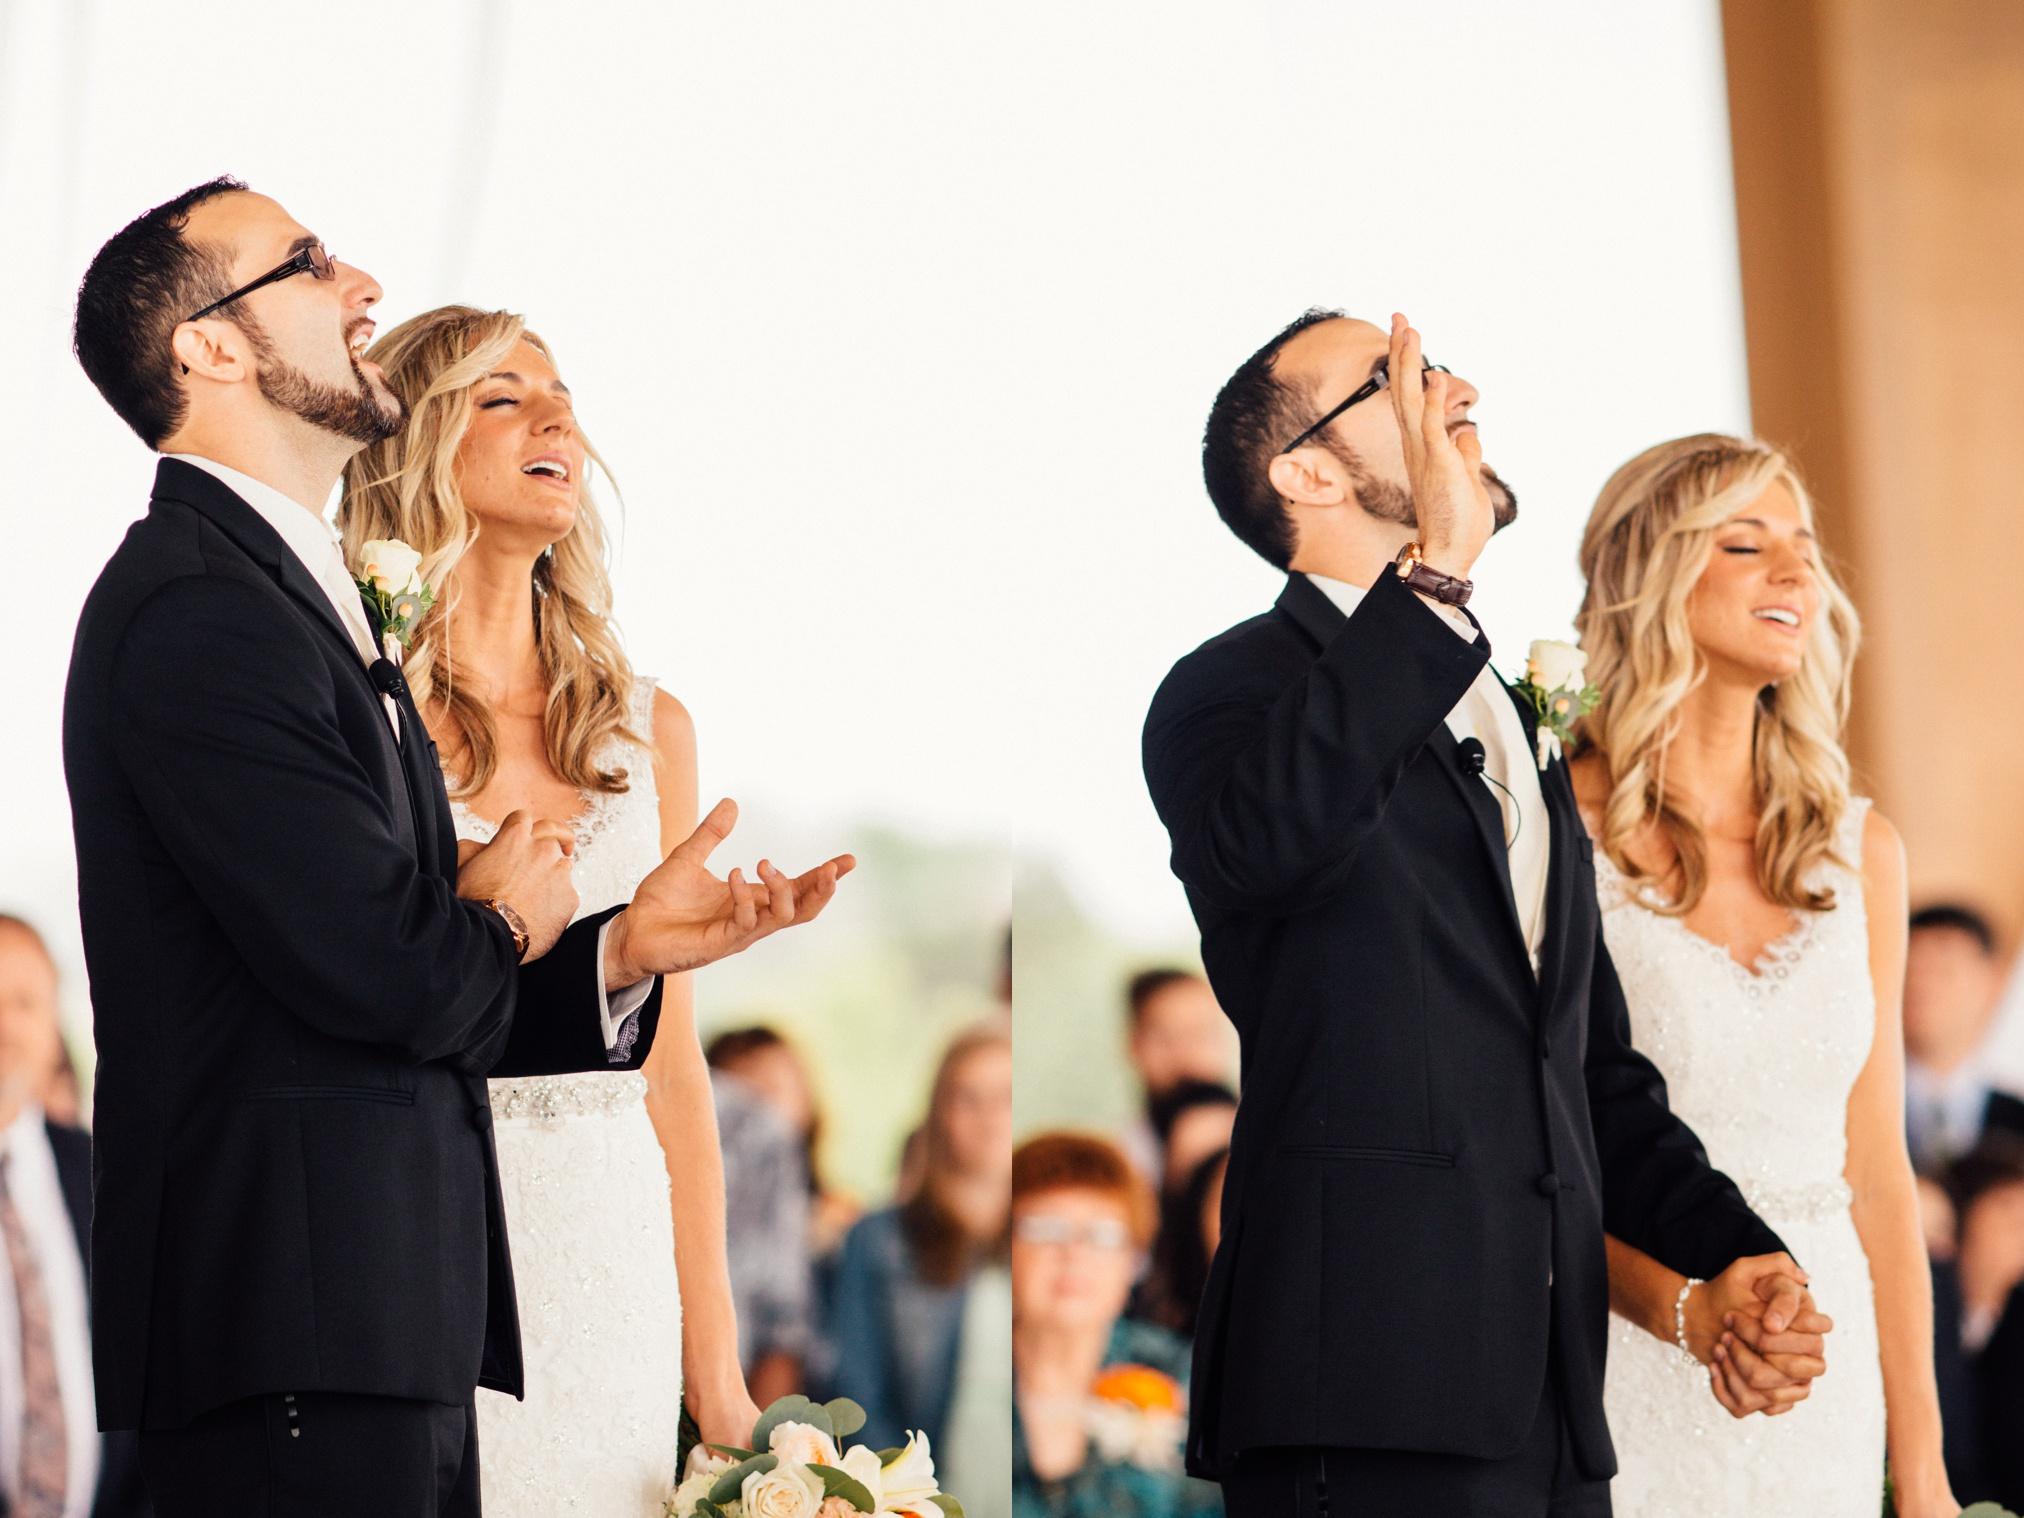 schmid_wedding-438.jpg